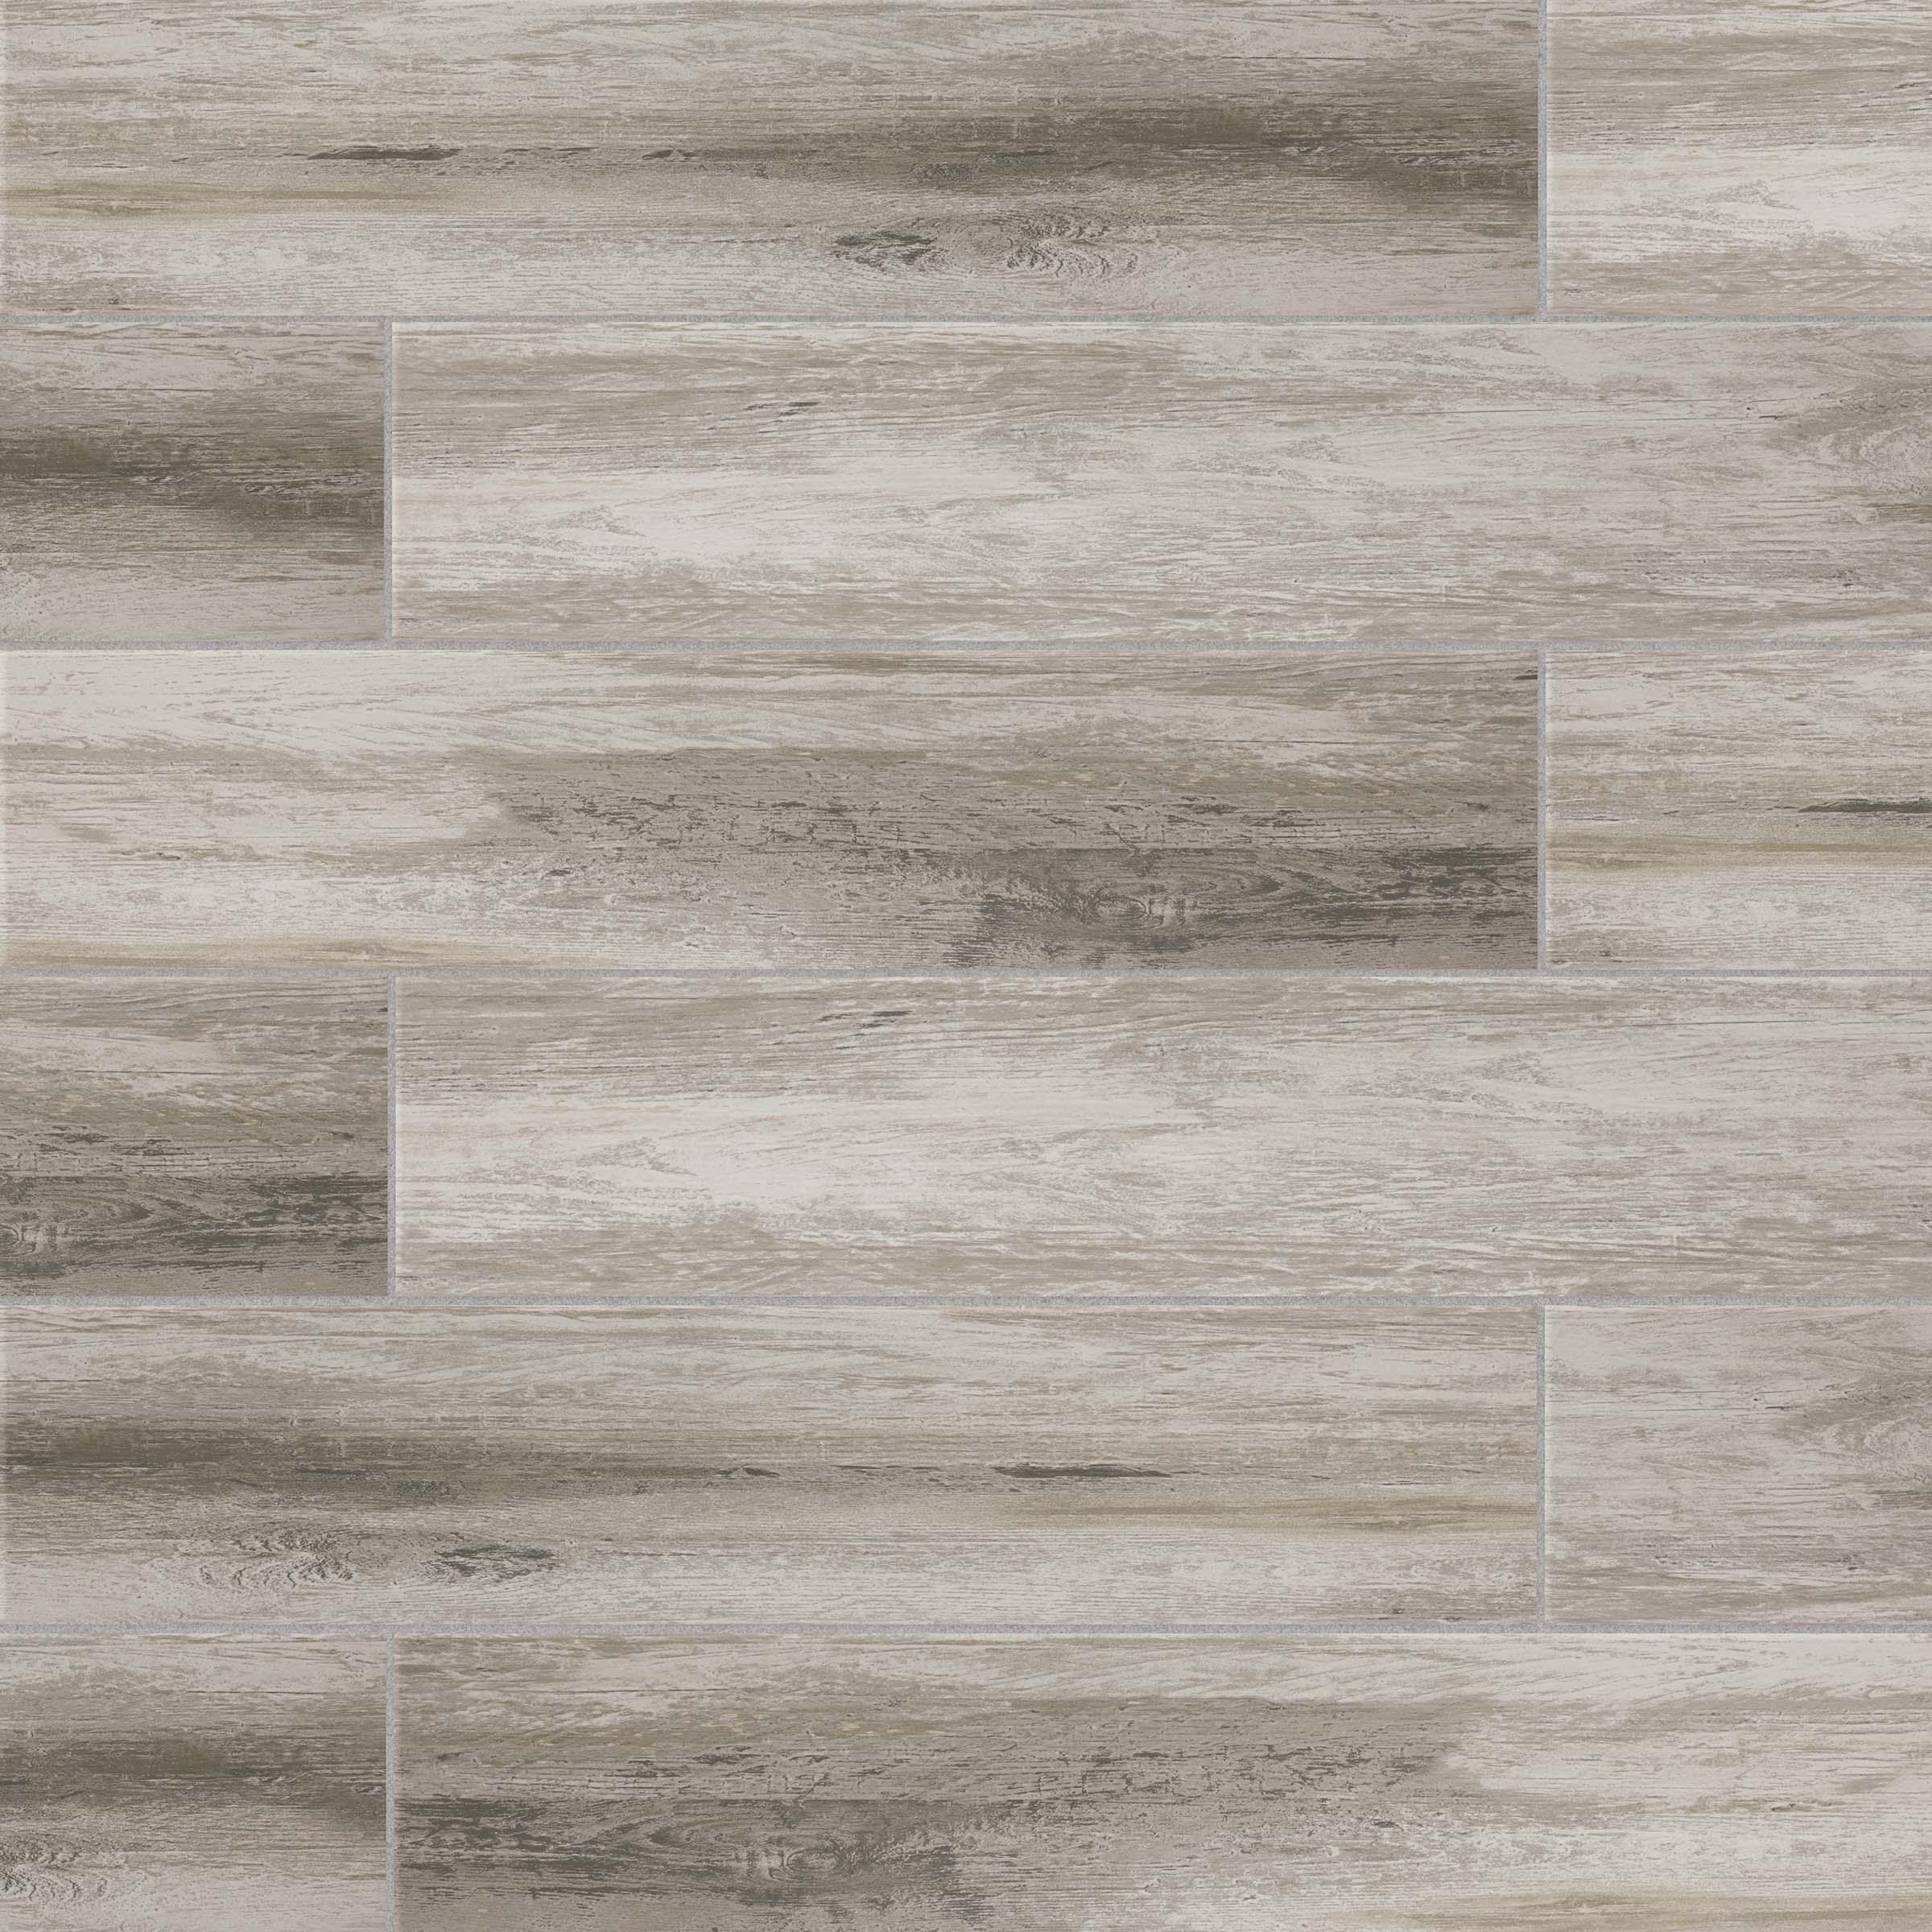 distressed 8 in x 24 in wood look porcelain field tile in betulla